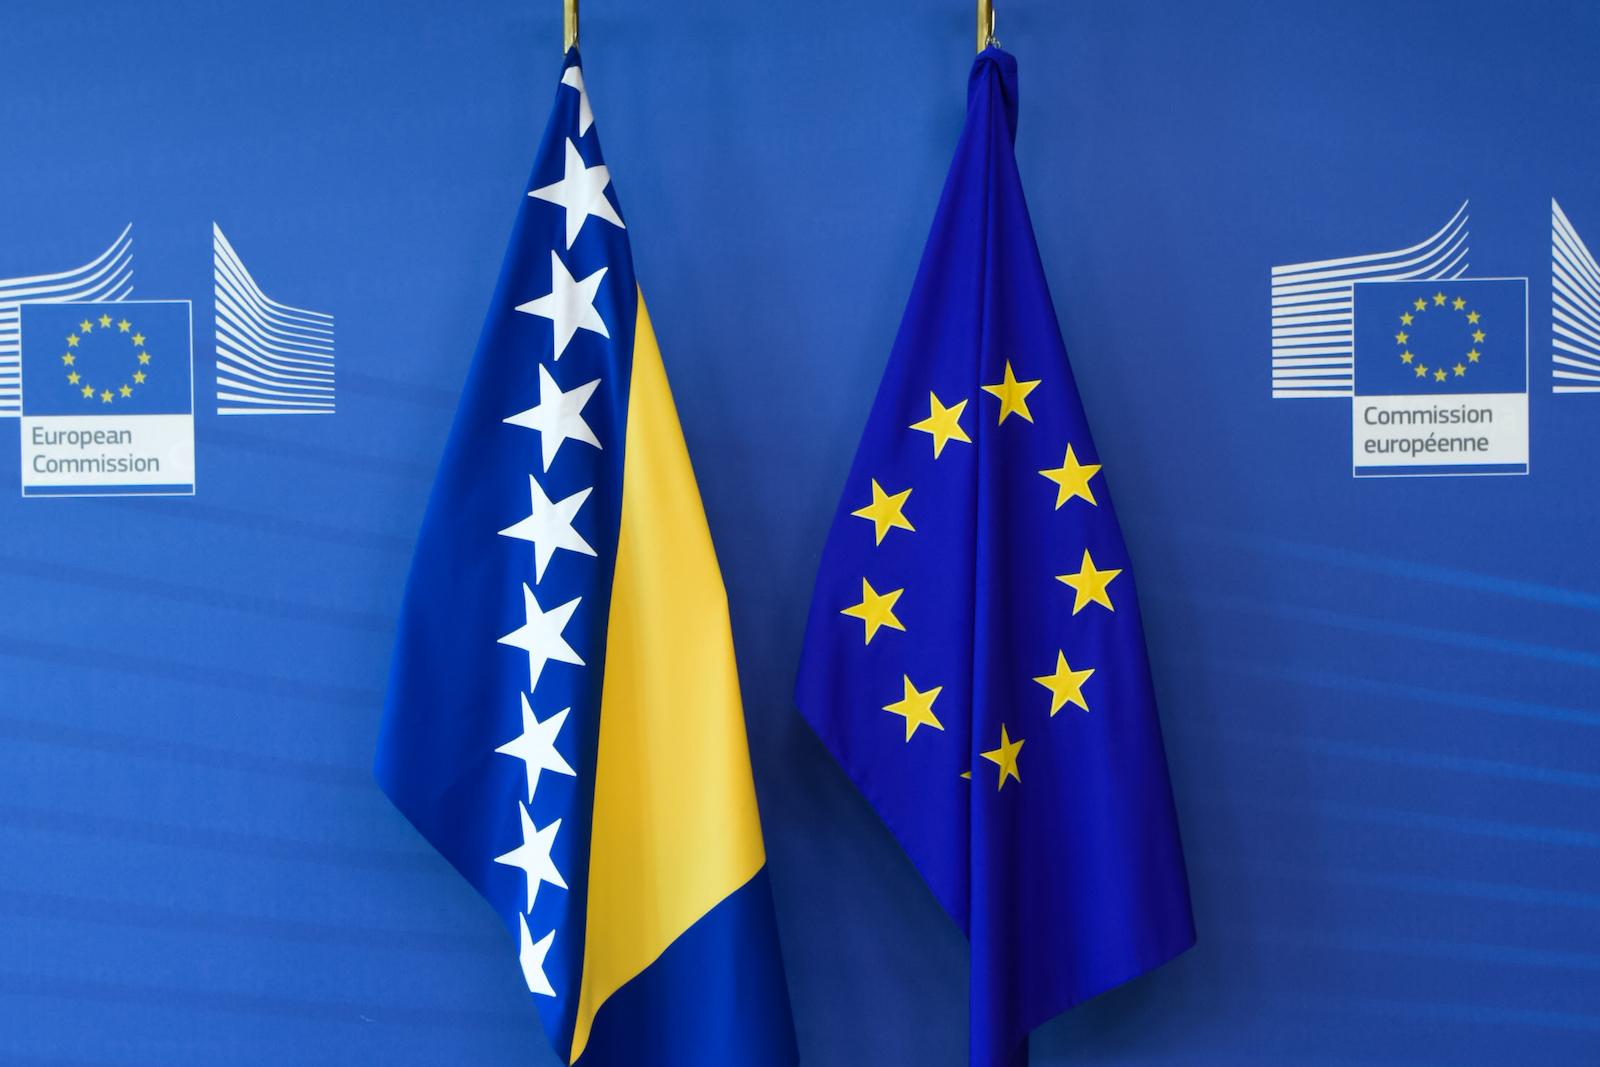 BiH: €125 million in macro-financial assistance (MFA) for Bosnia and Herzegovina